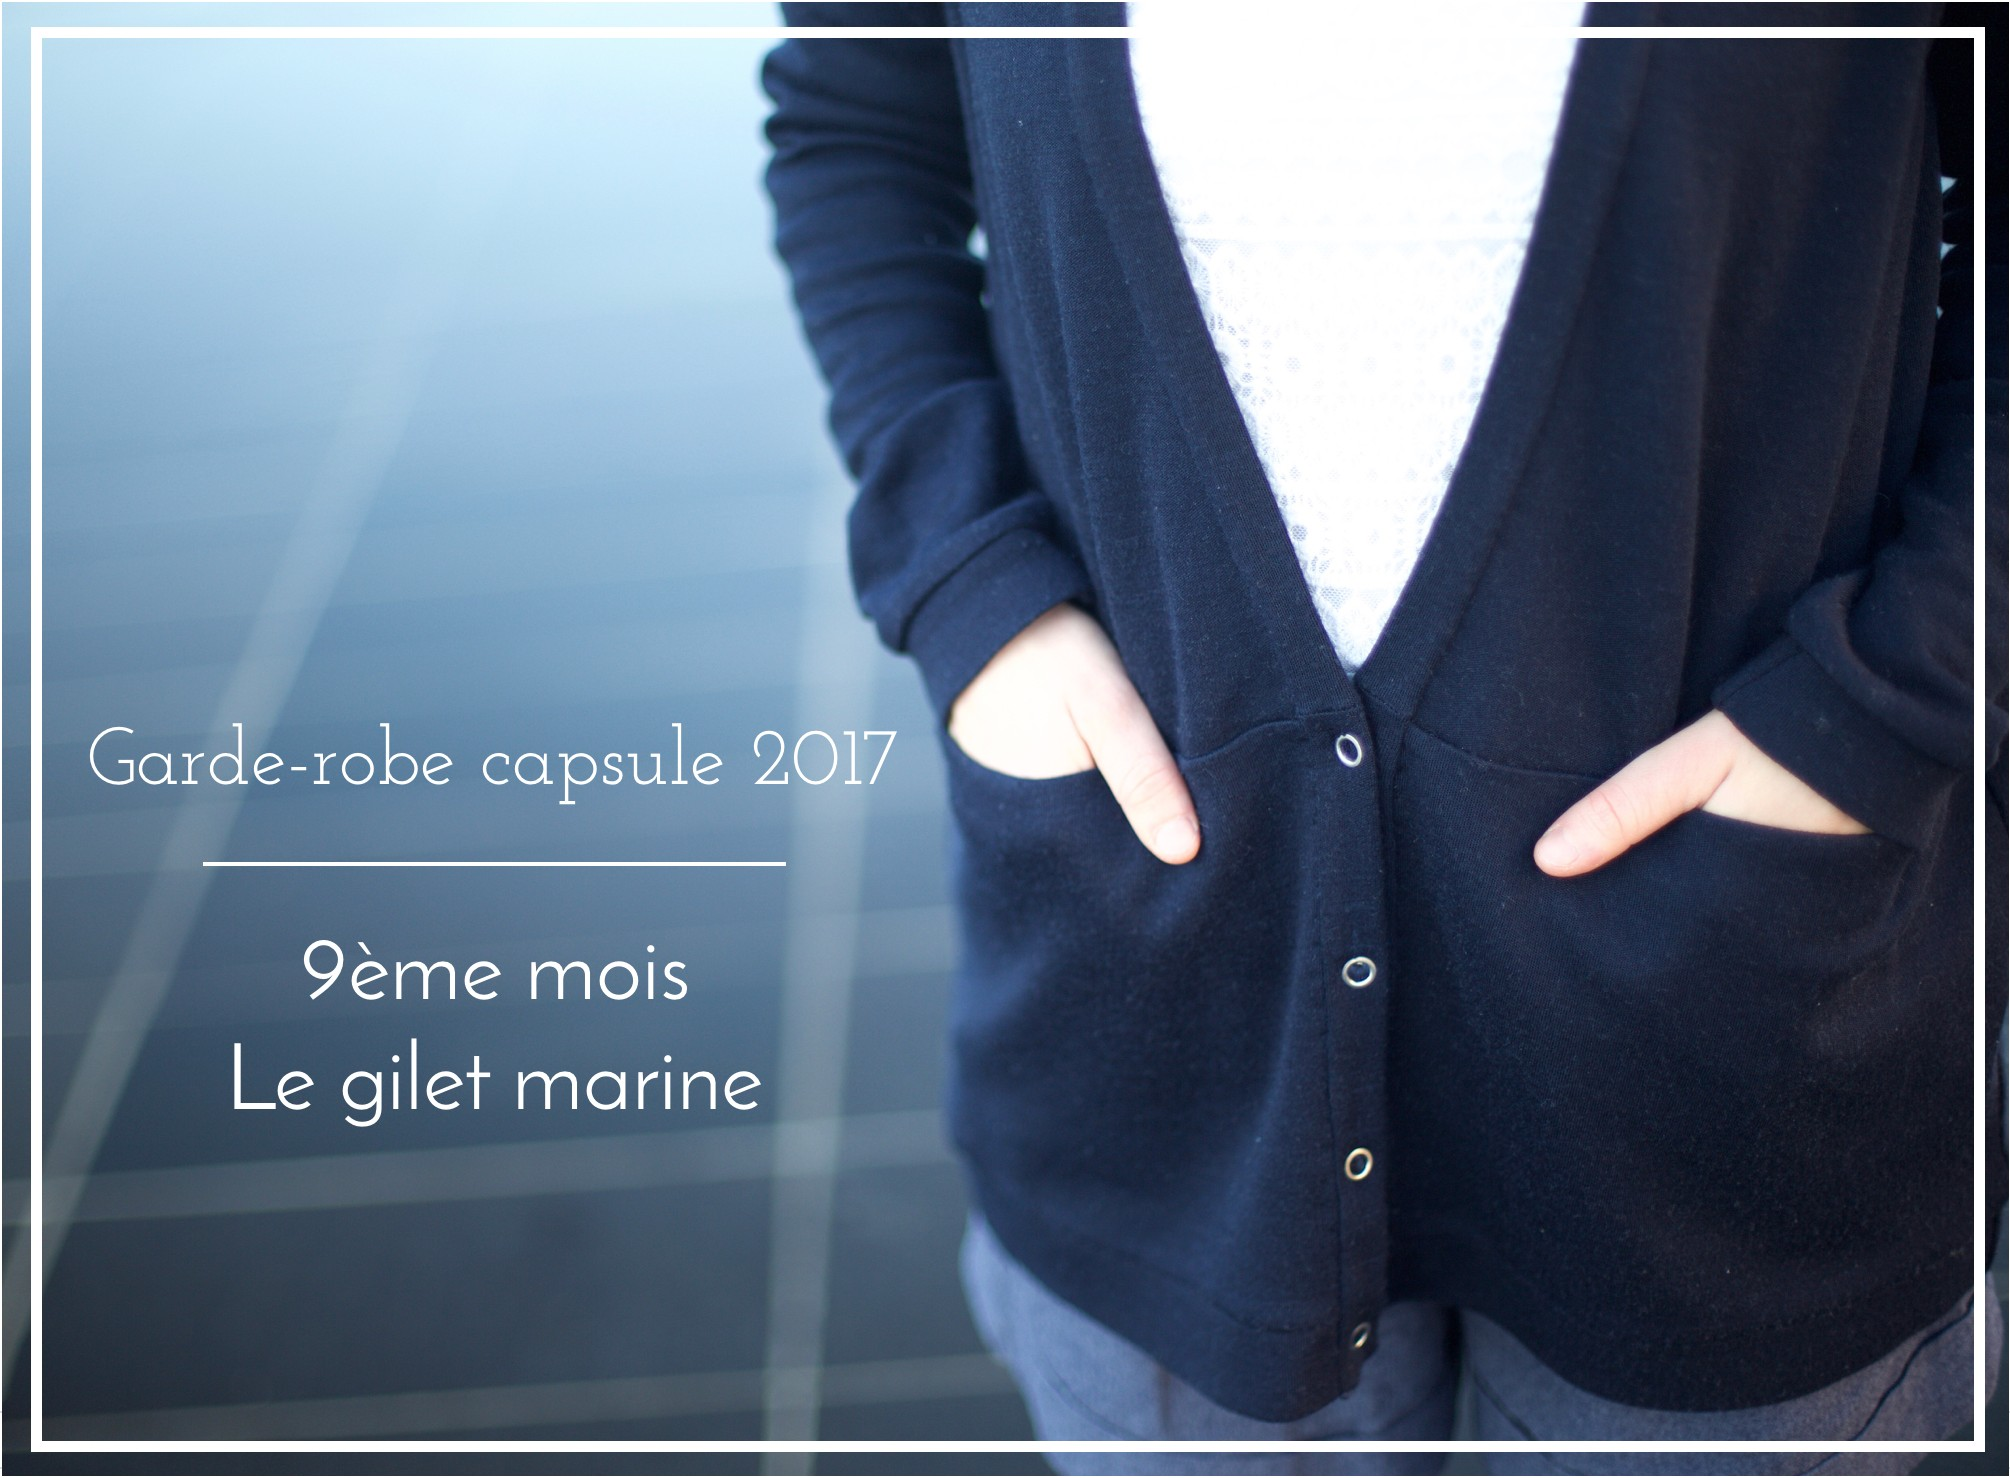 Je couds ma garde-robe capsule 2017 - Driftless Cardigan - Grainline Studio